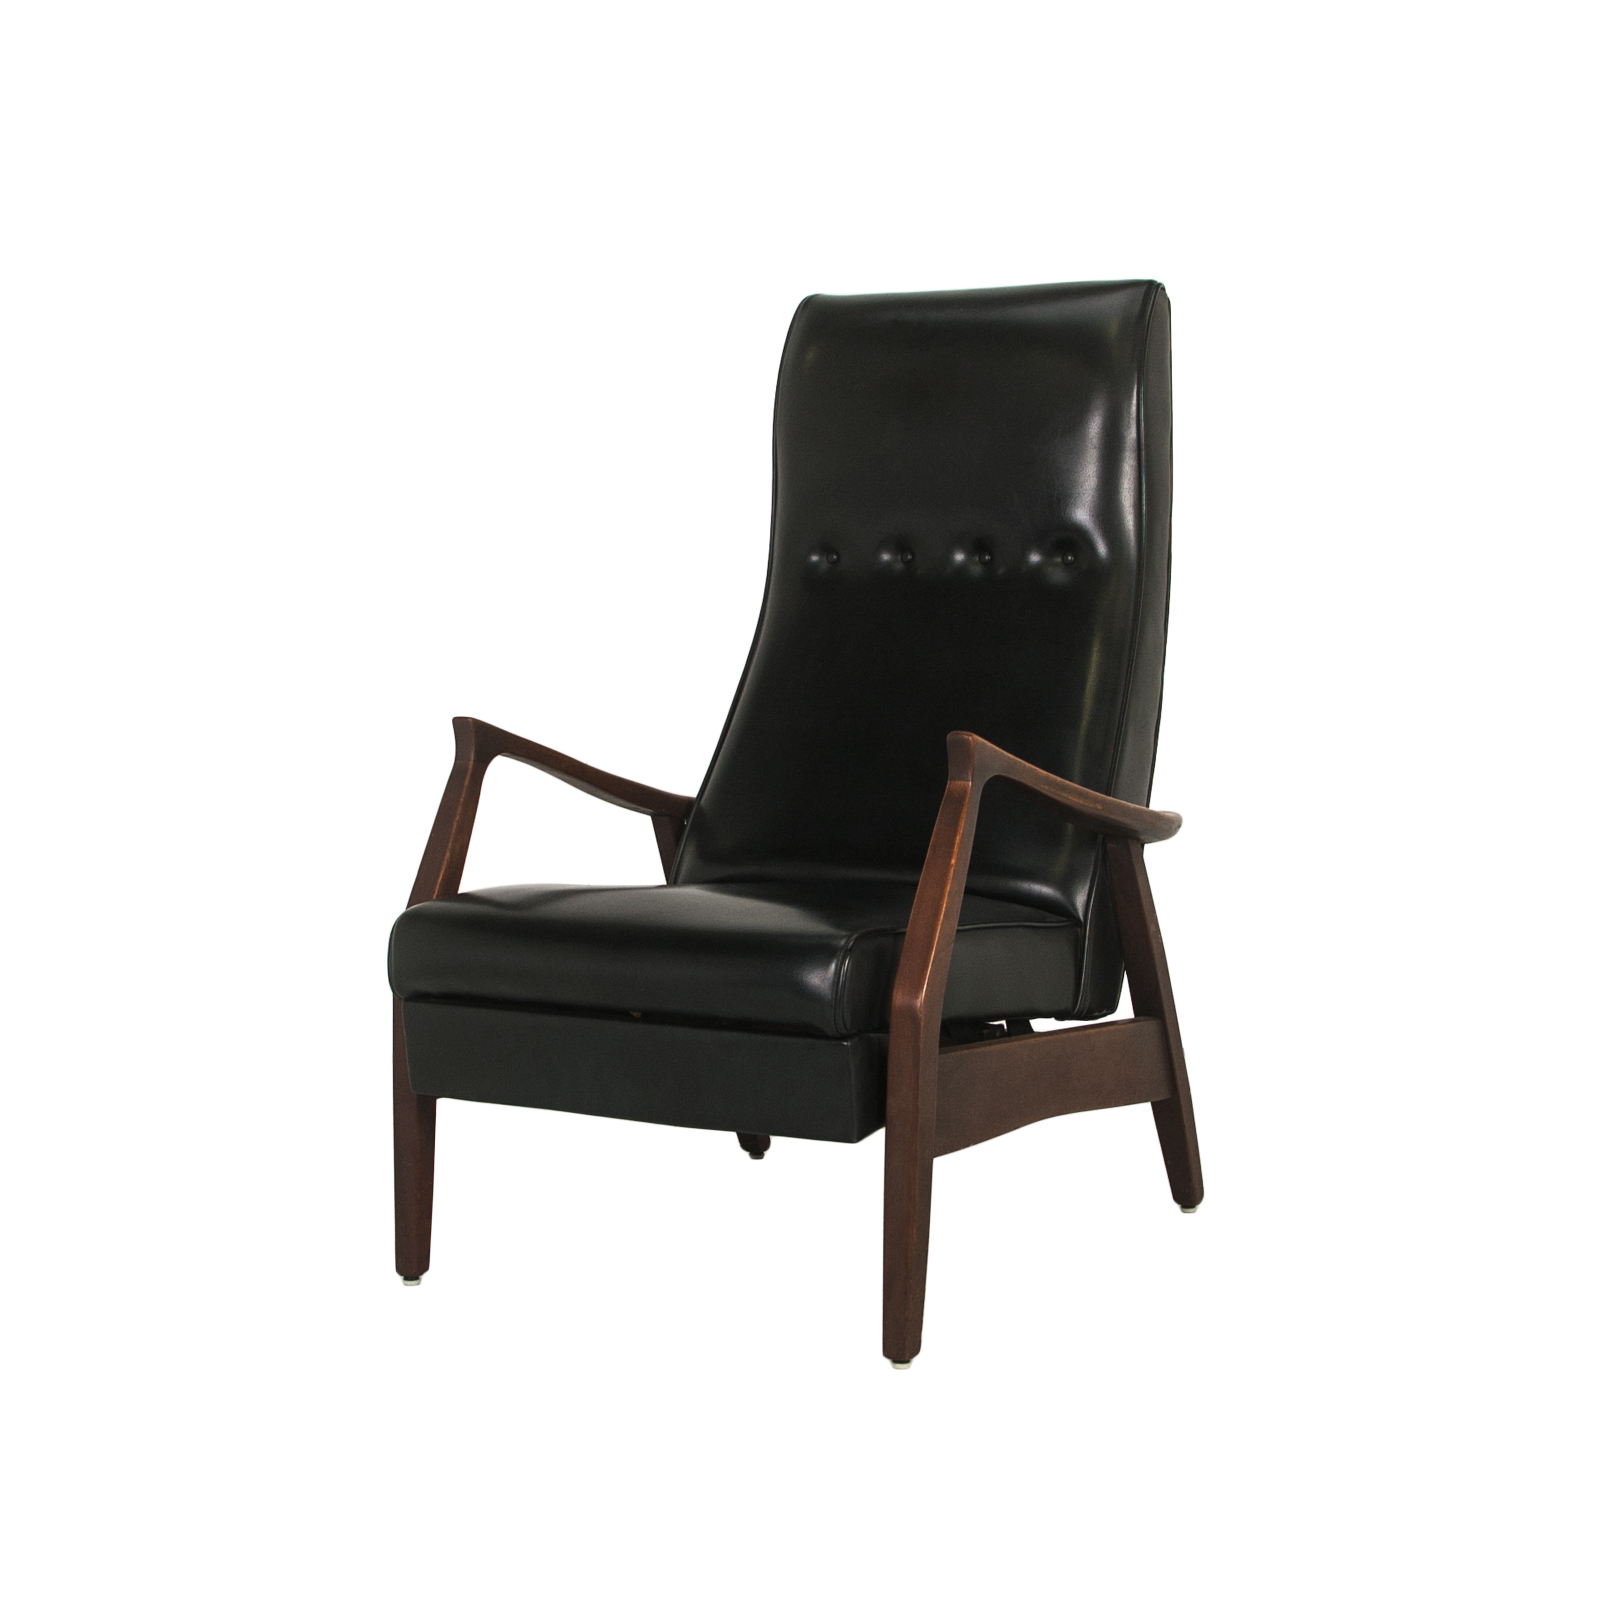 recliner chair hire hanging stand cheap rentals milo baughman design event furniture